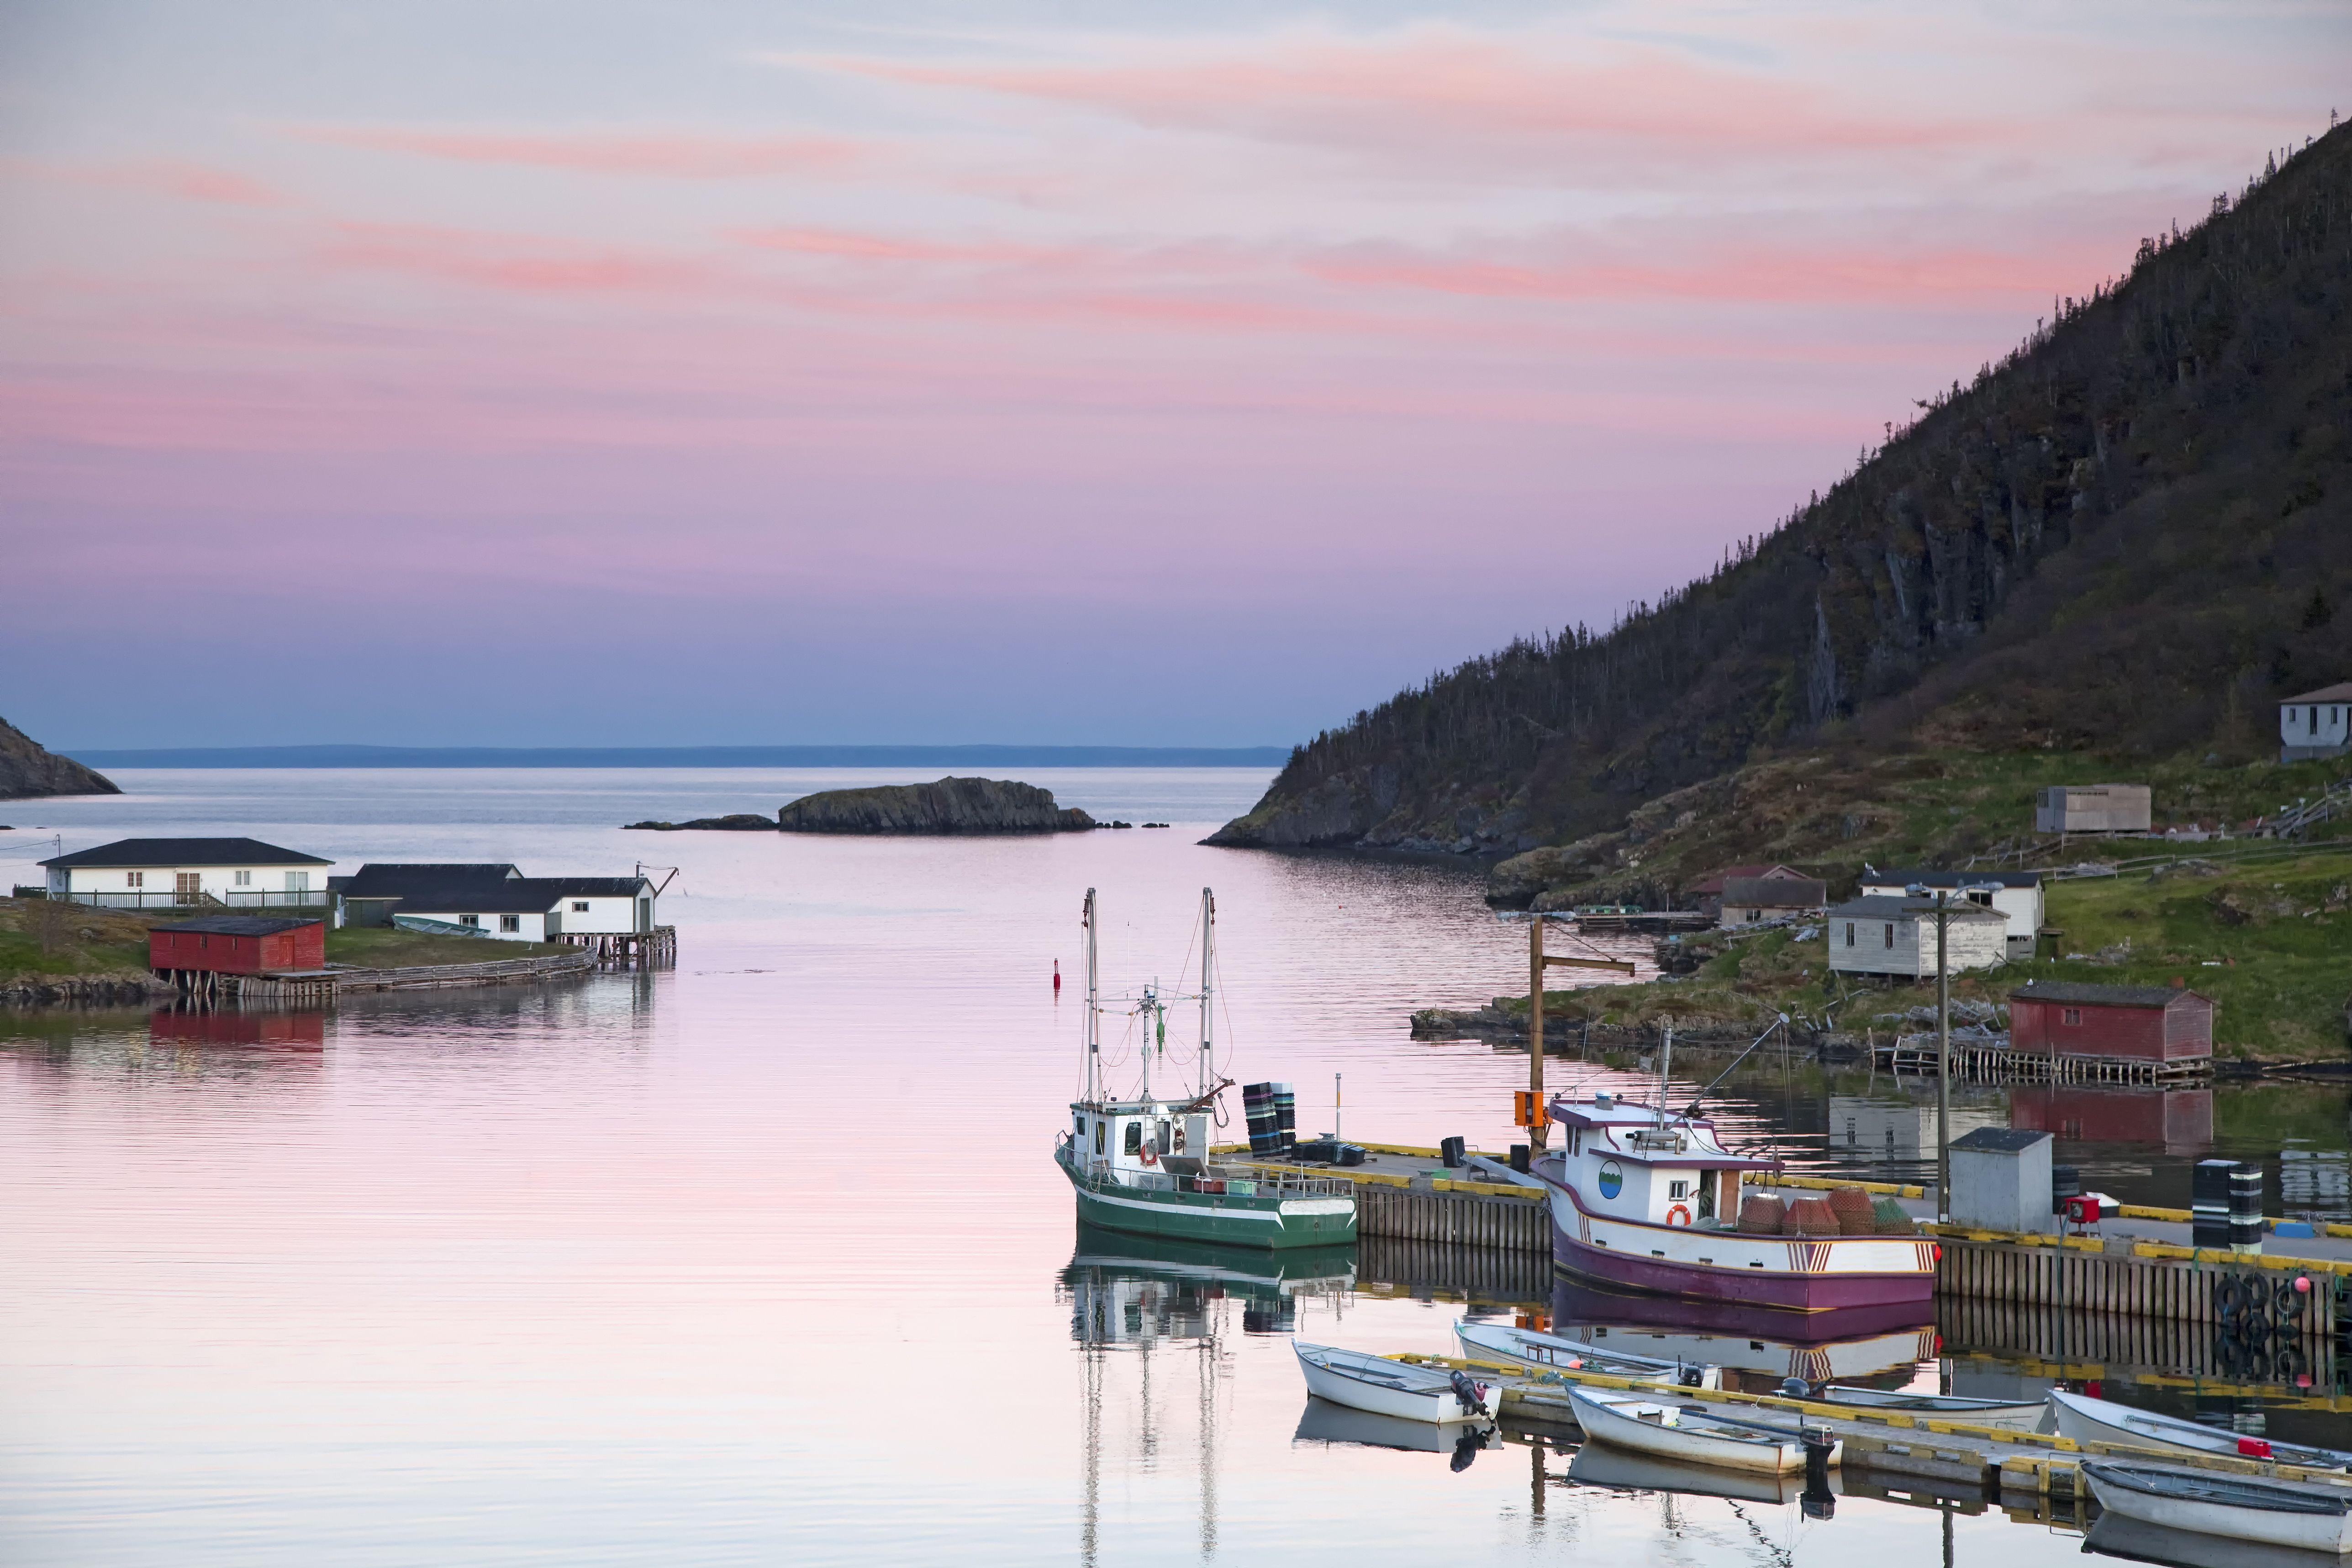 Boats mooring in calm bay